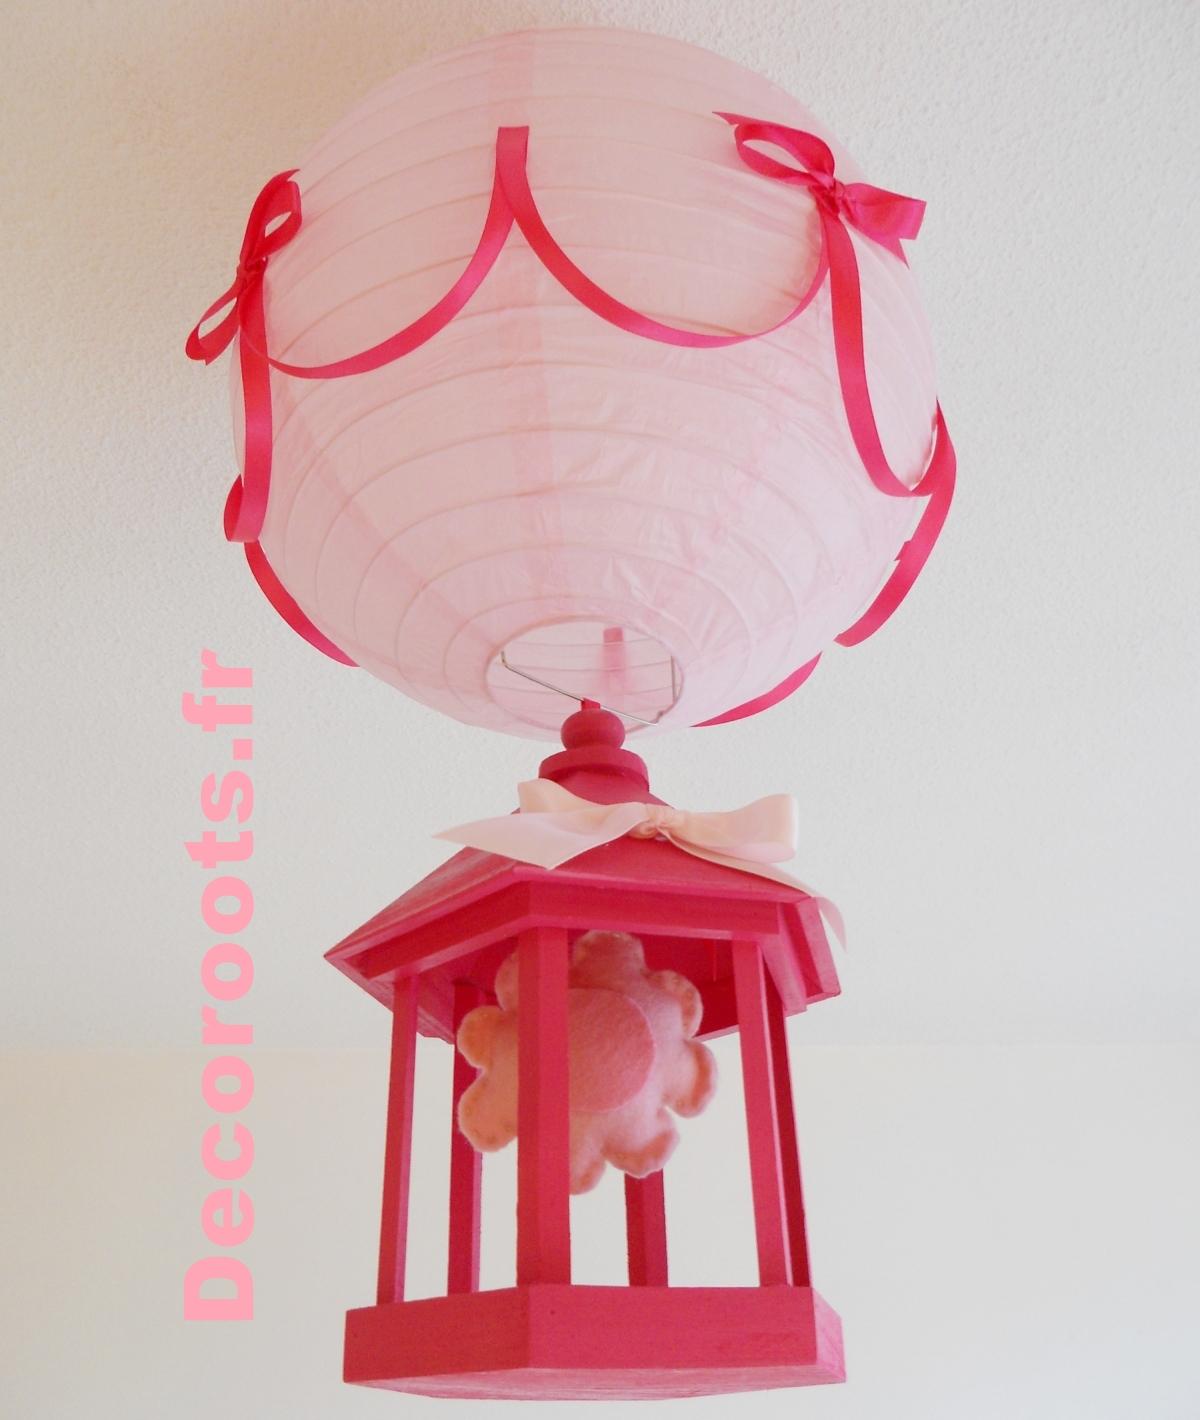 enfant b b luminaire enfant b b decoroots. Black Bedroom Furniture Sets. Home Design Ideas